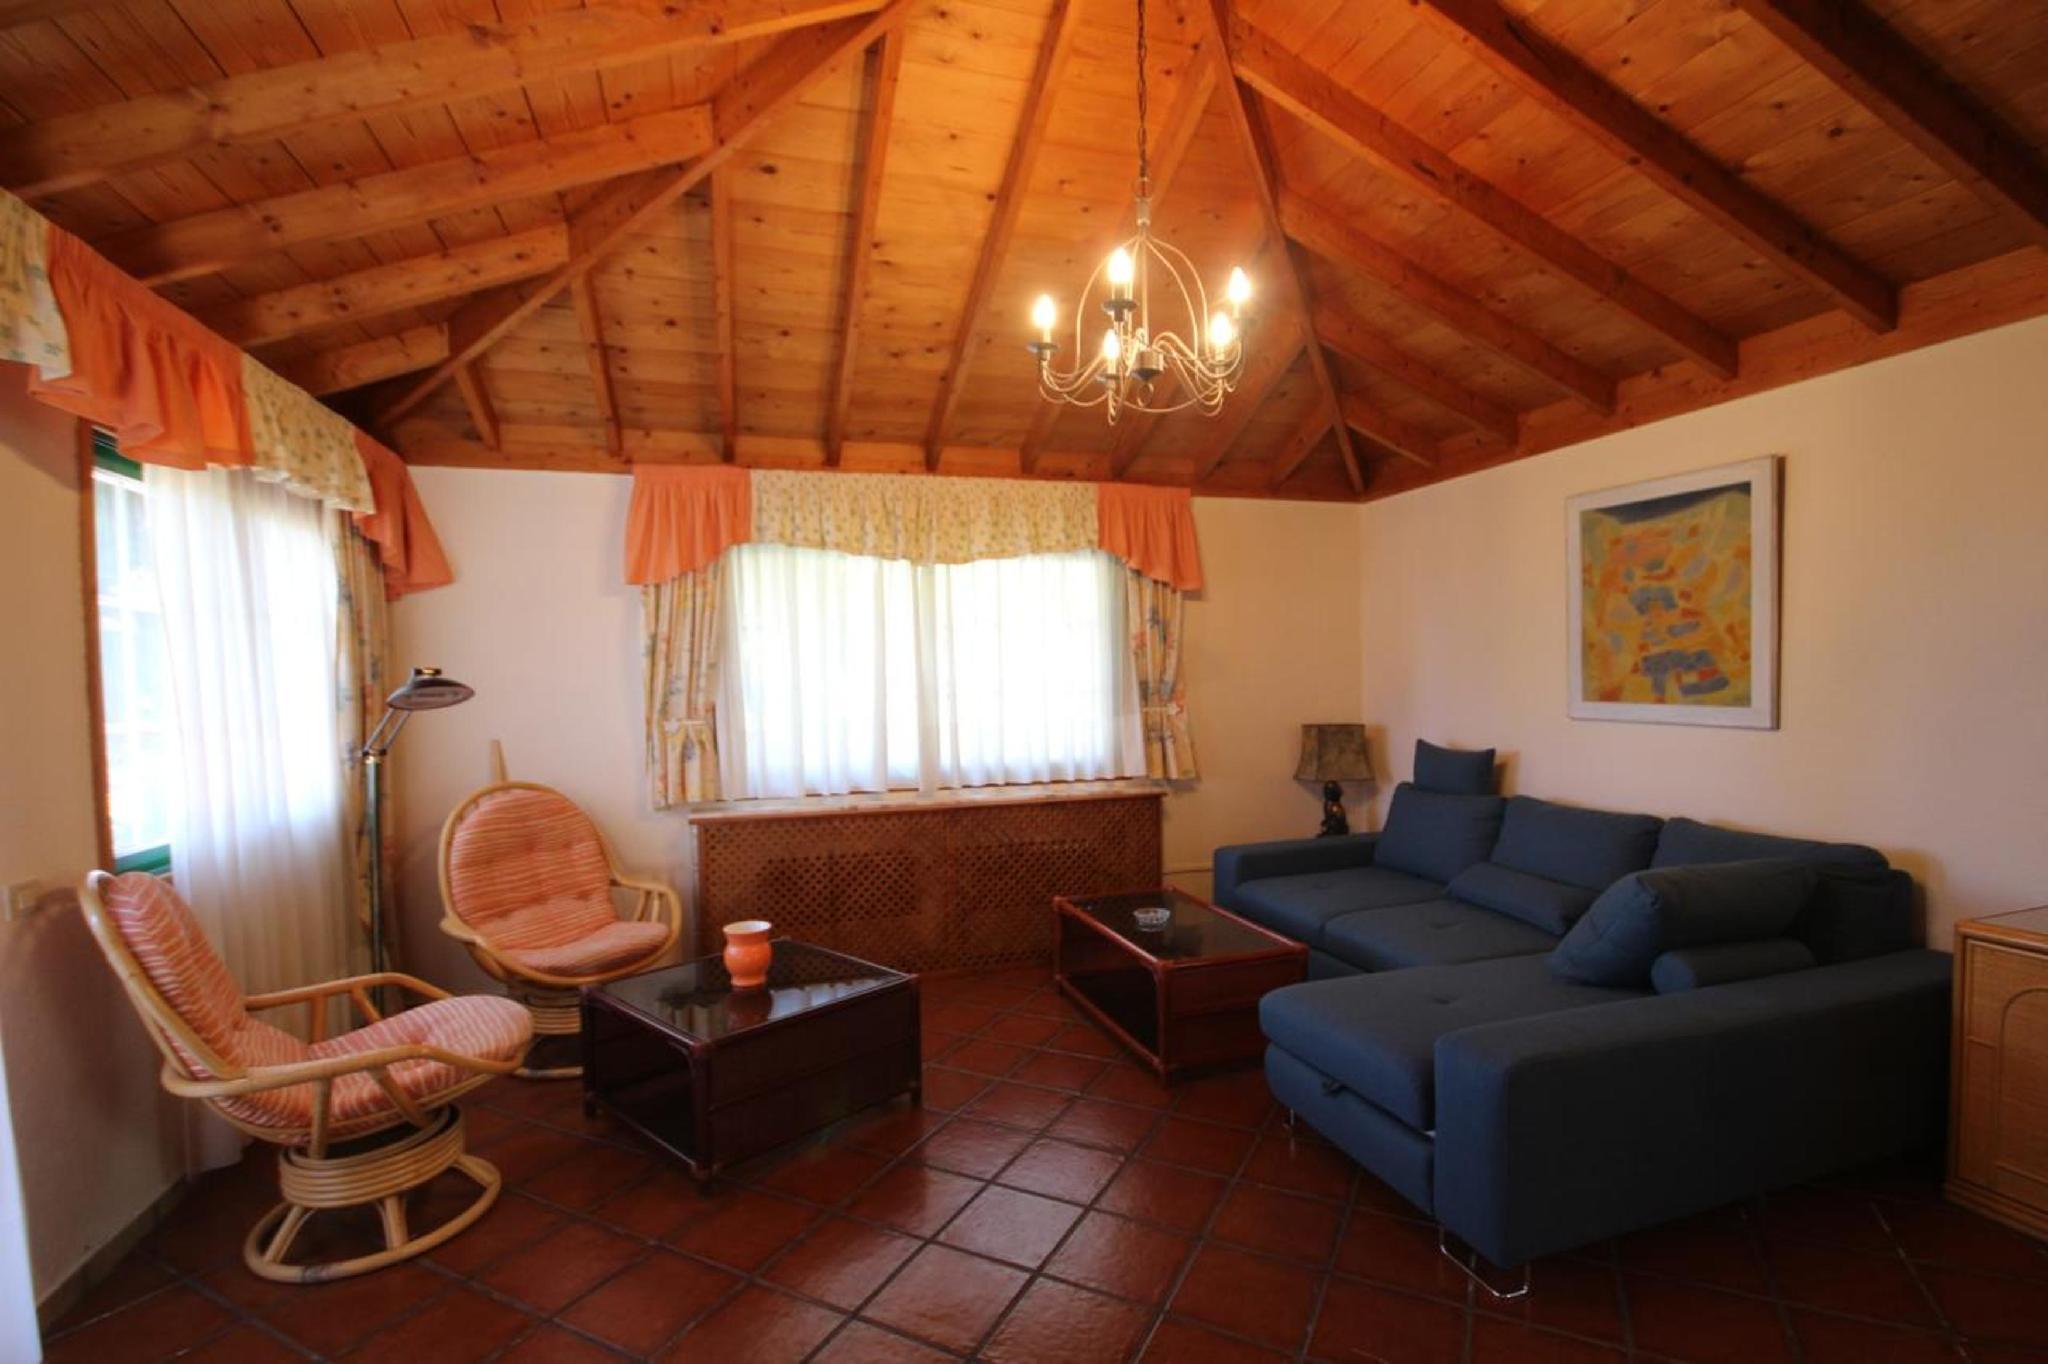 107128 - Apartment in Vilaflor